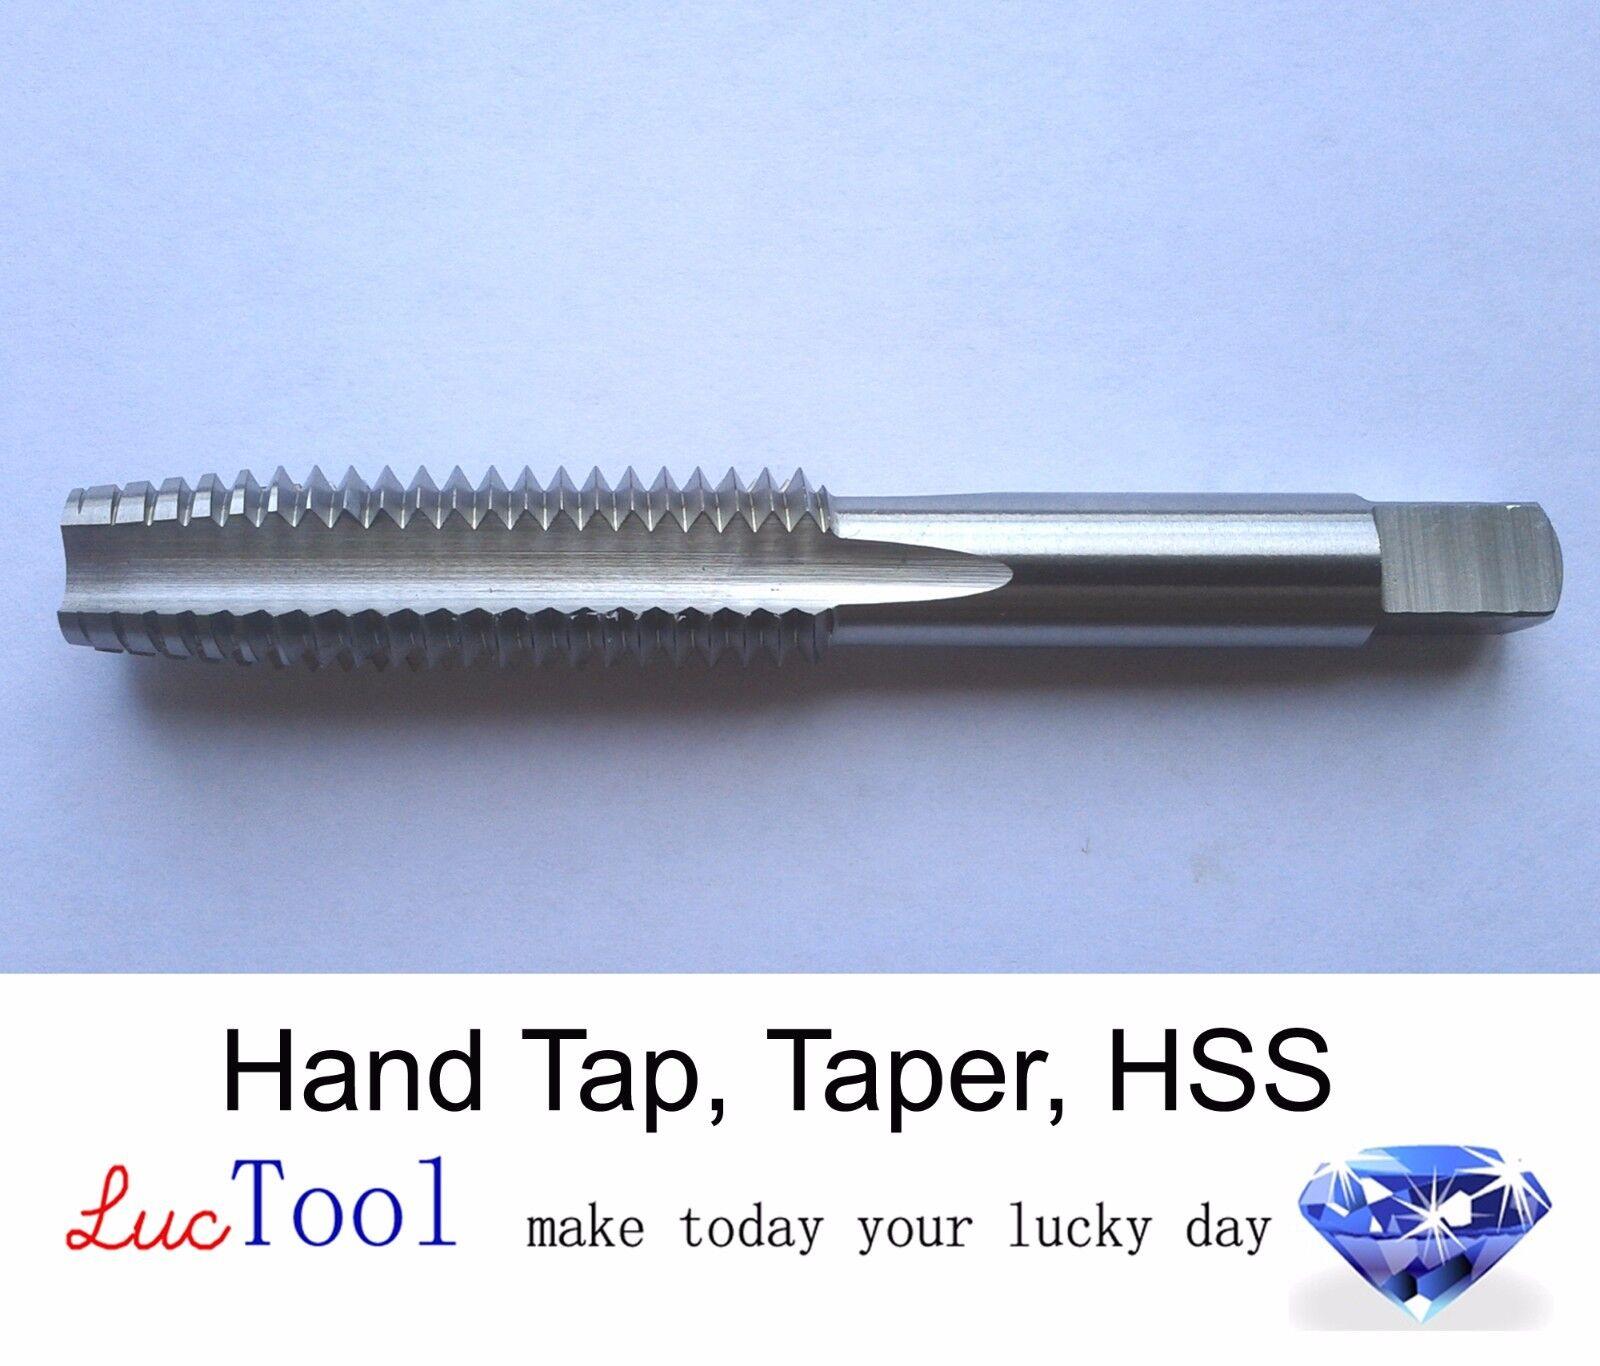 9//16-40 HSS Taper Hand Tap